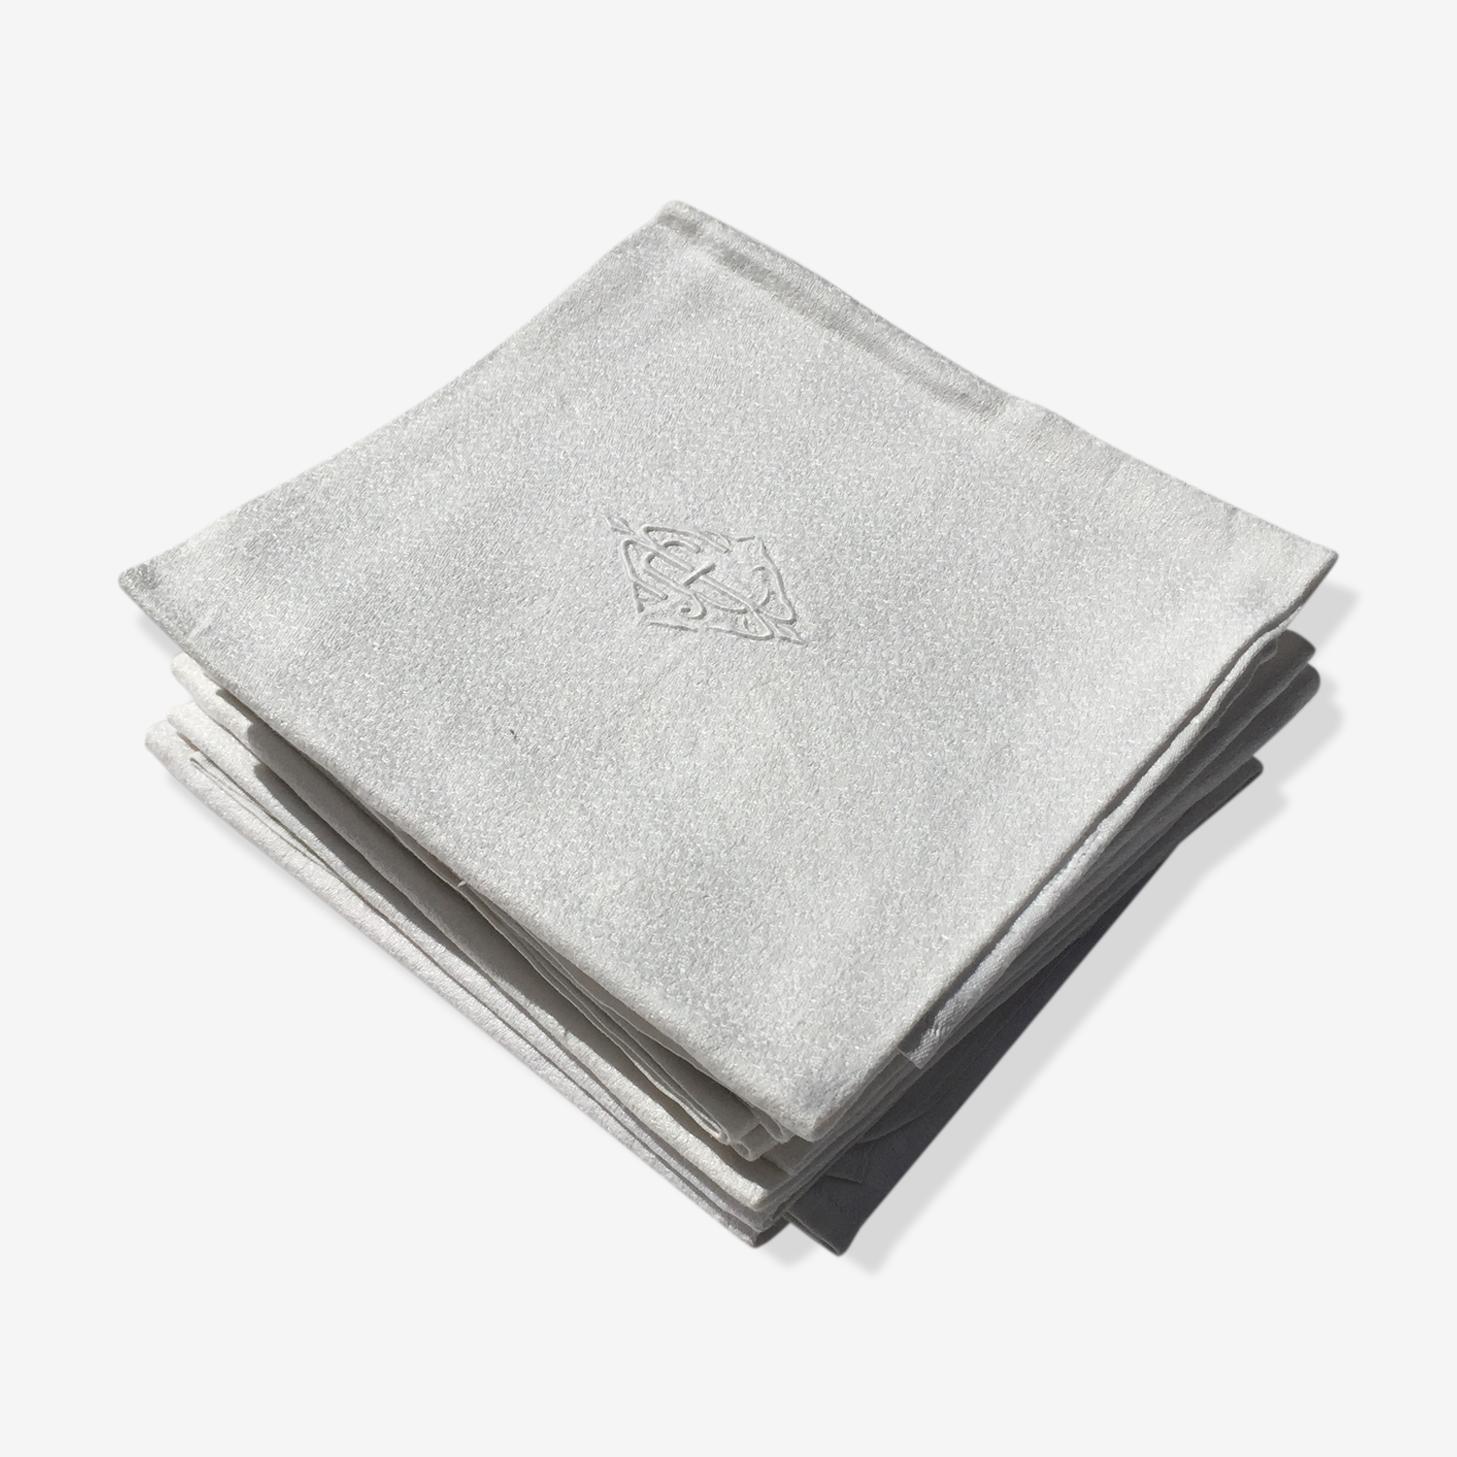 Set of towels monogram